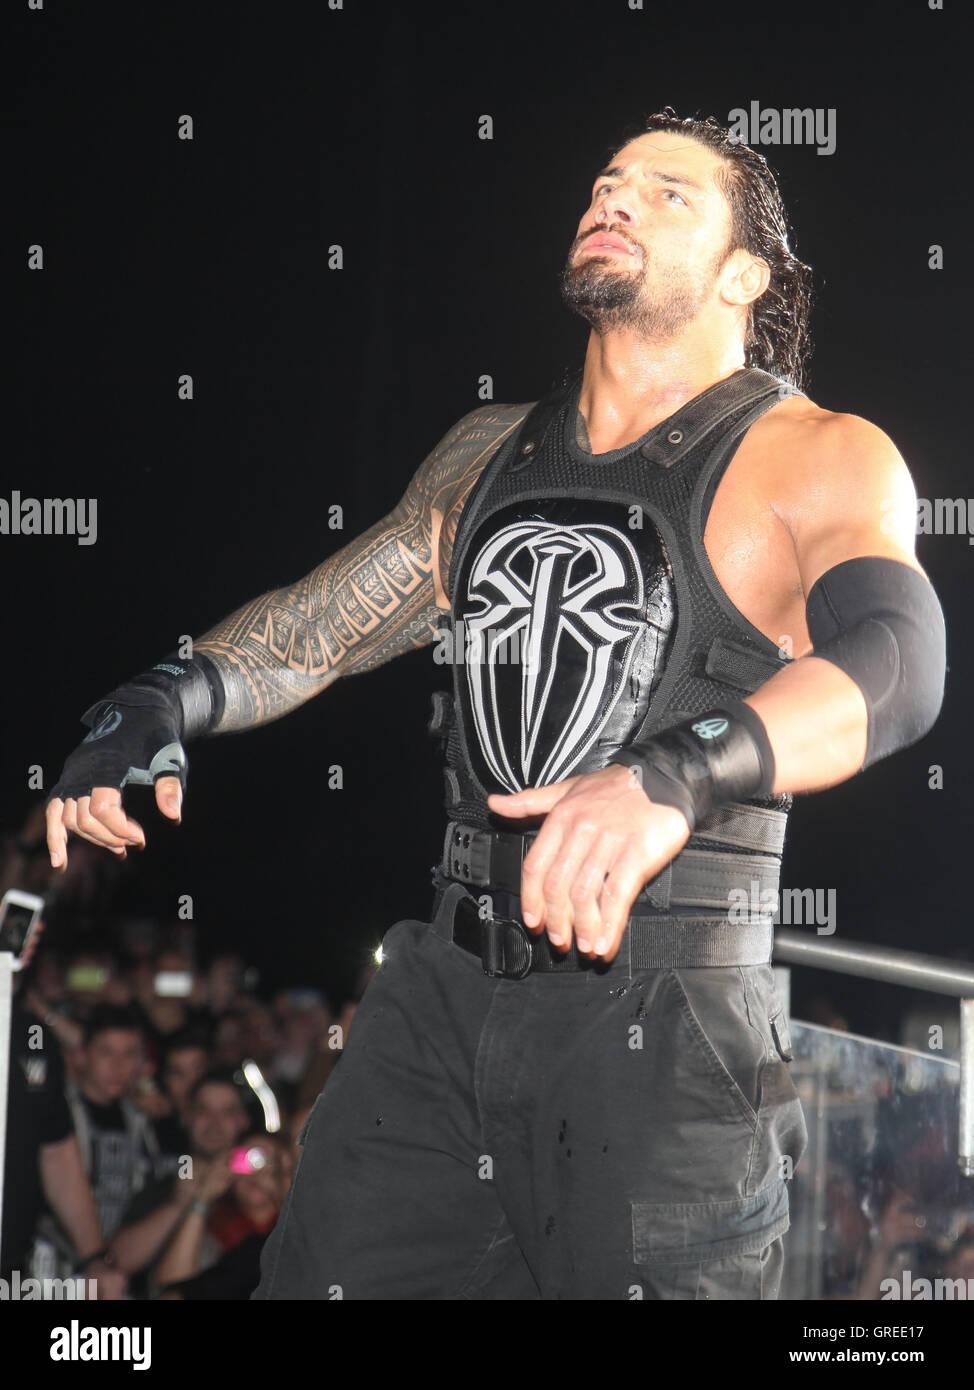 Wwe Superstar Roman Reigns - Stock Image